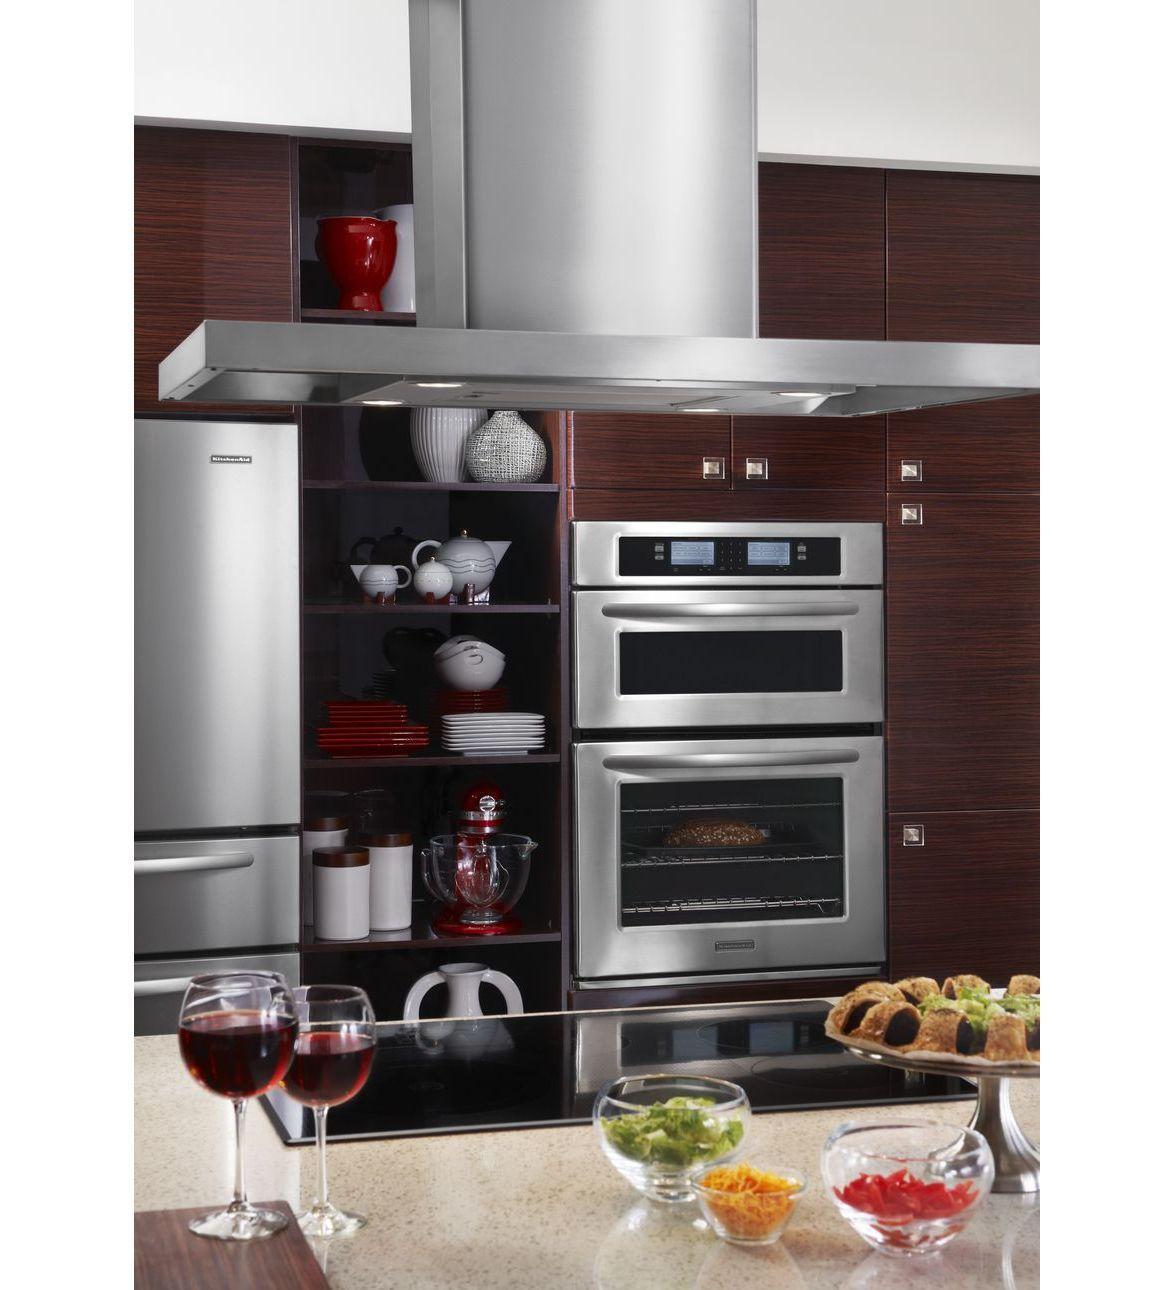 Kitchenaid 174 30 Inch Steam Assist Combination Microwave